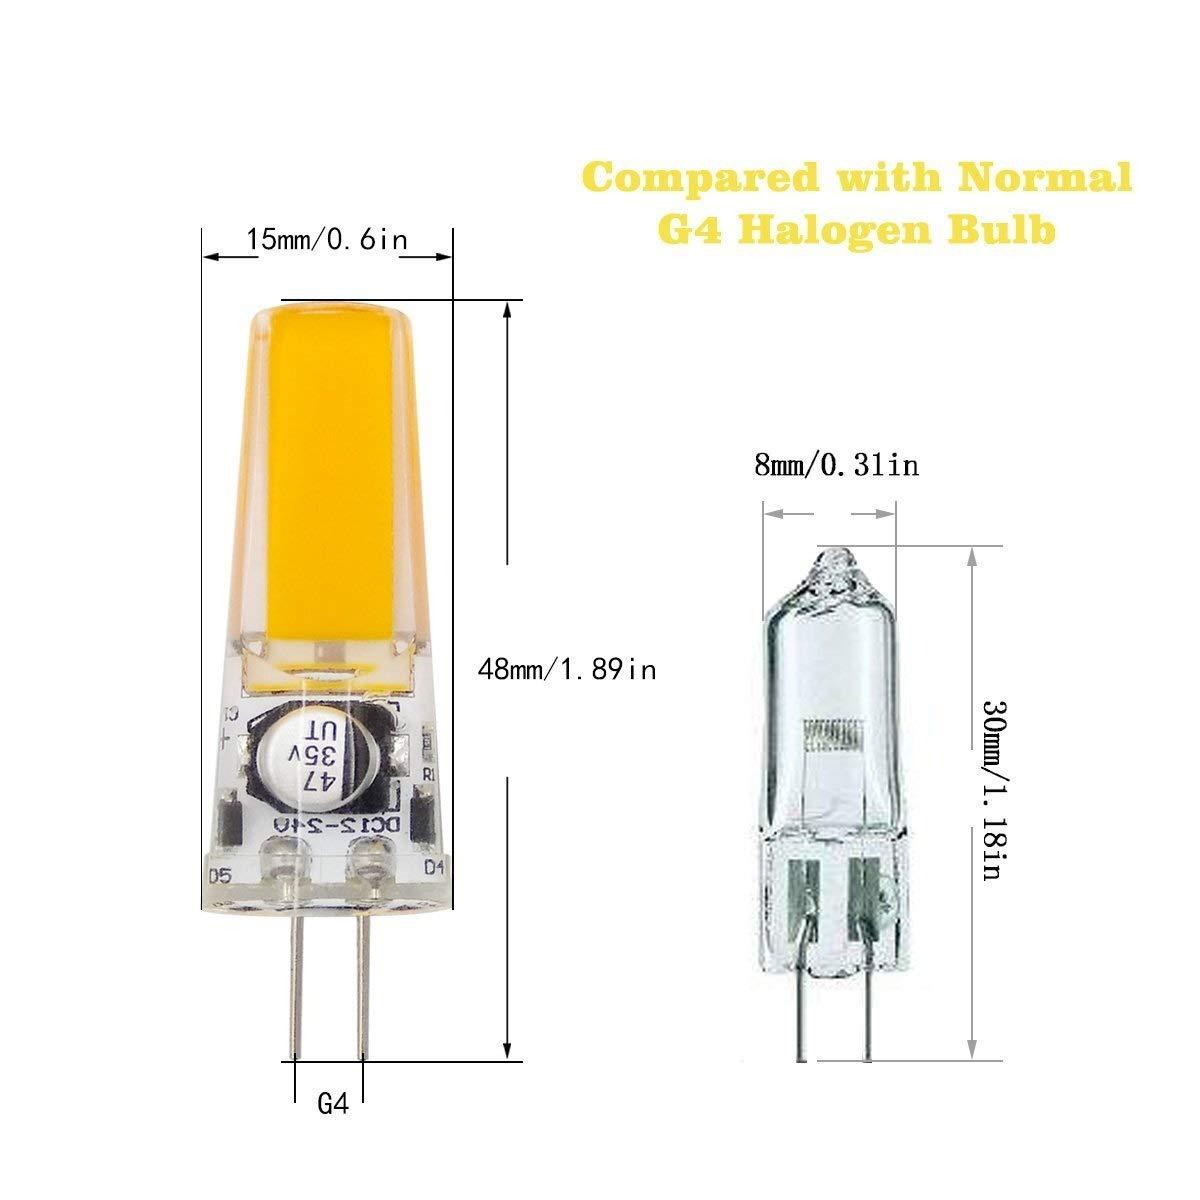 Dig dog bone LED Bulbs G4 LED Bulb Bin-pin Light Bulb COB 3W G4 Bulb Instead of Halogen Bulb 25W 340 Lumens DC//AC 12-24V Color : White Daylight Comfortable Glow 10 Pack